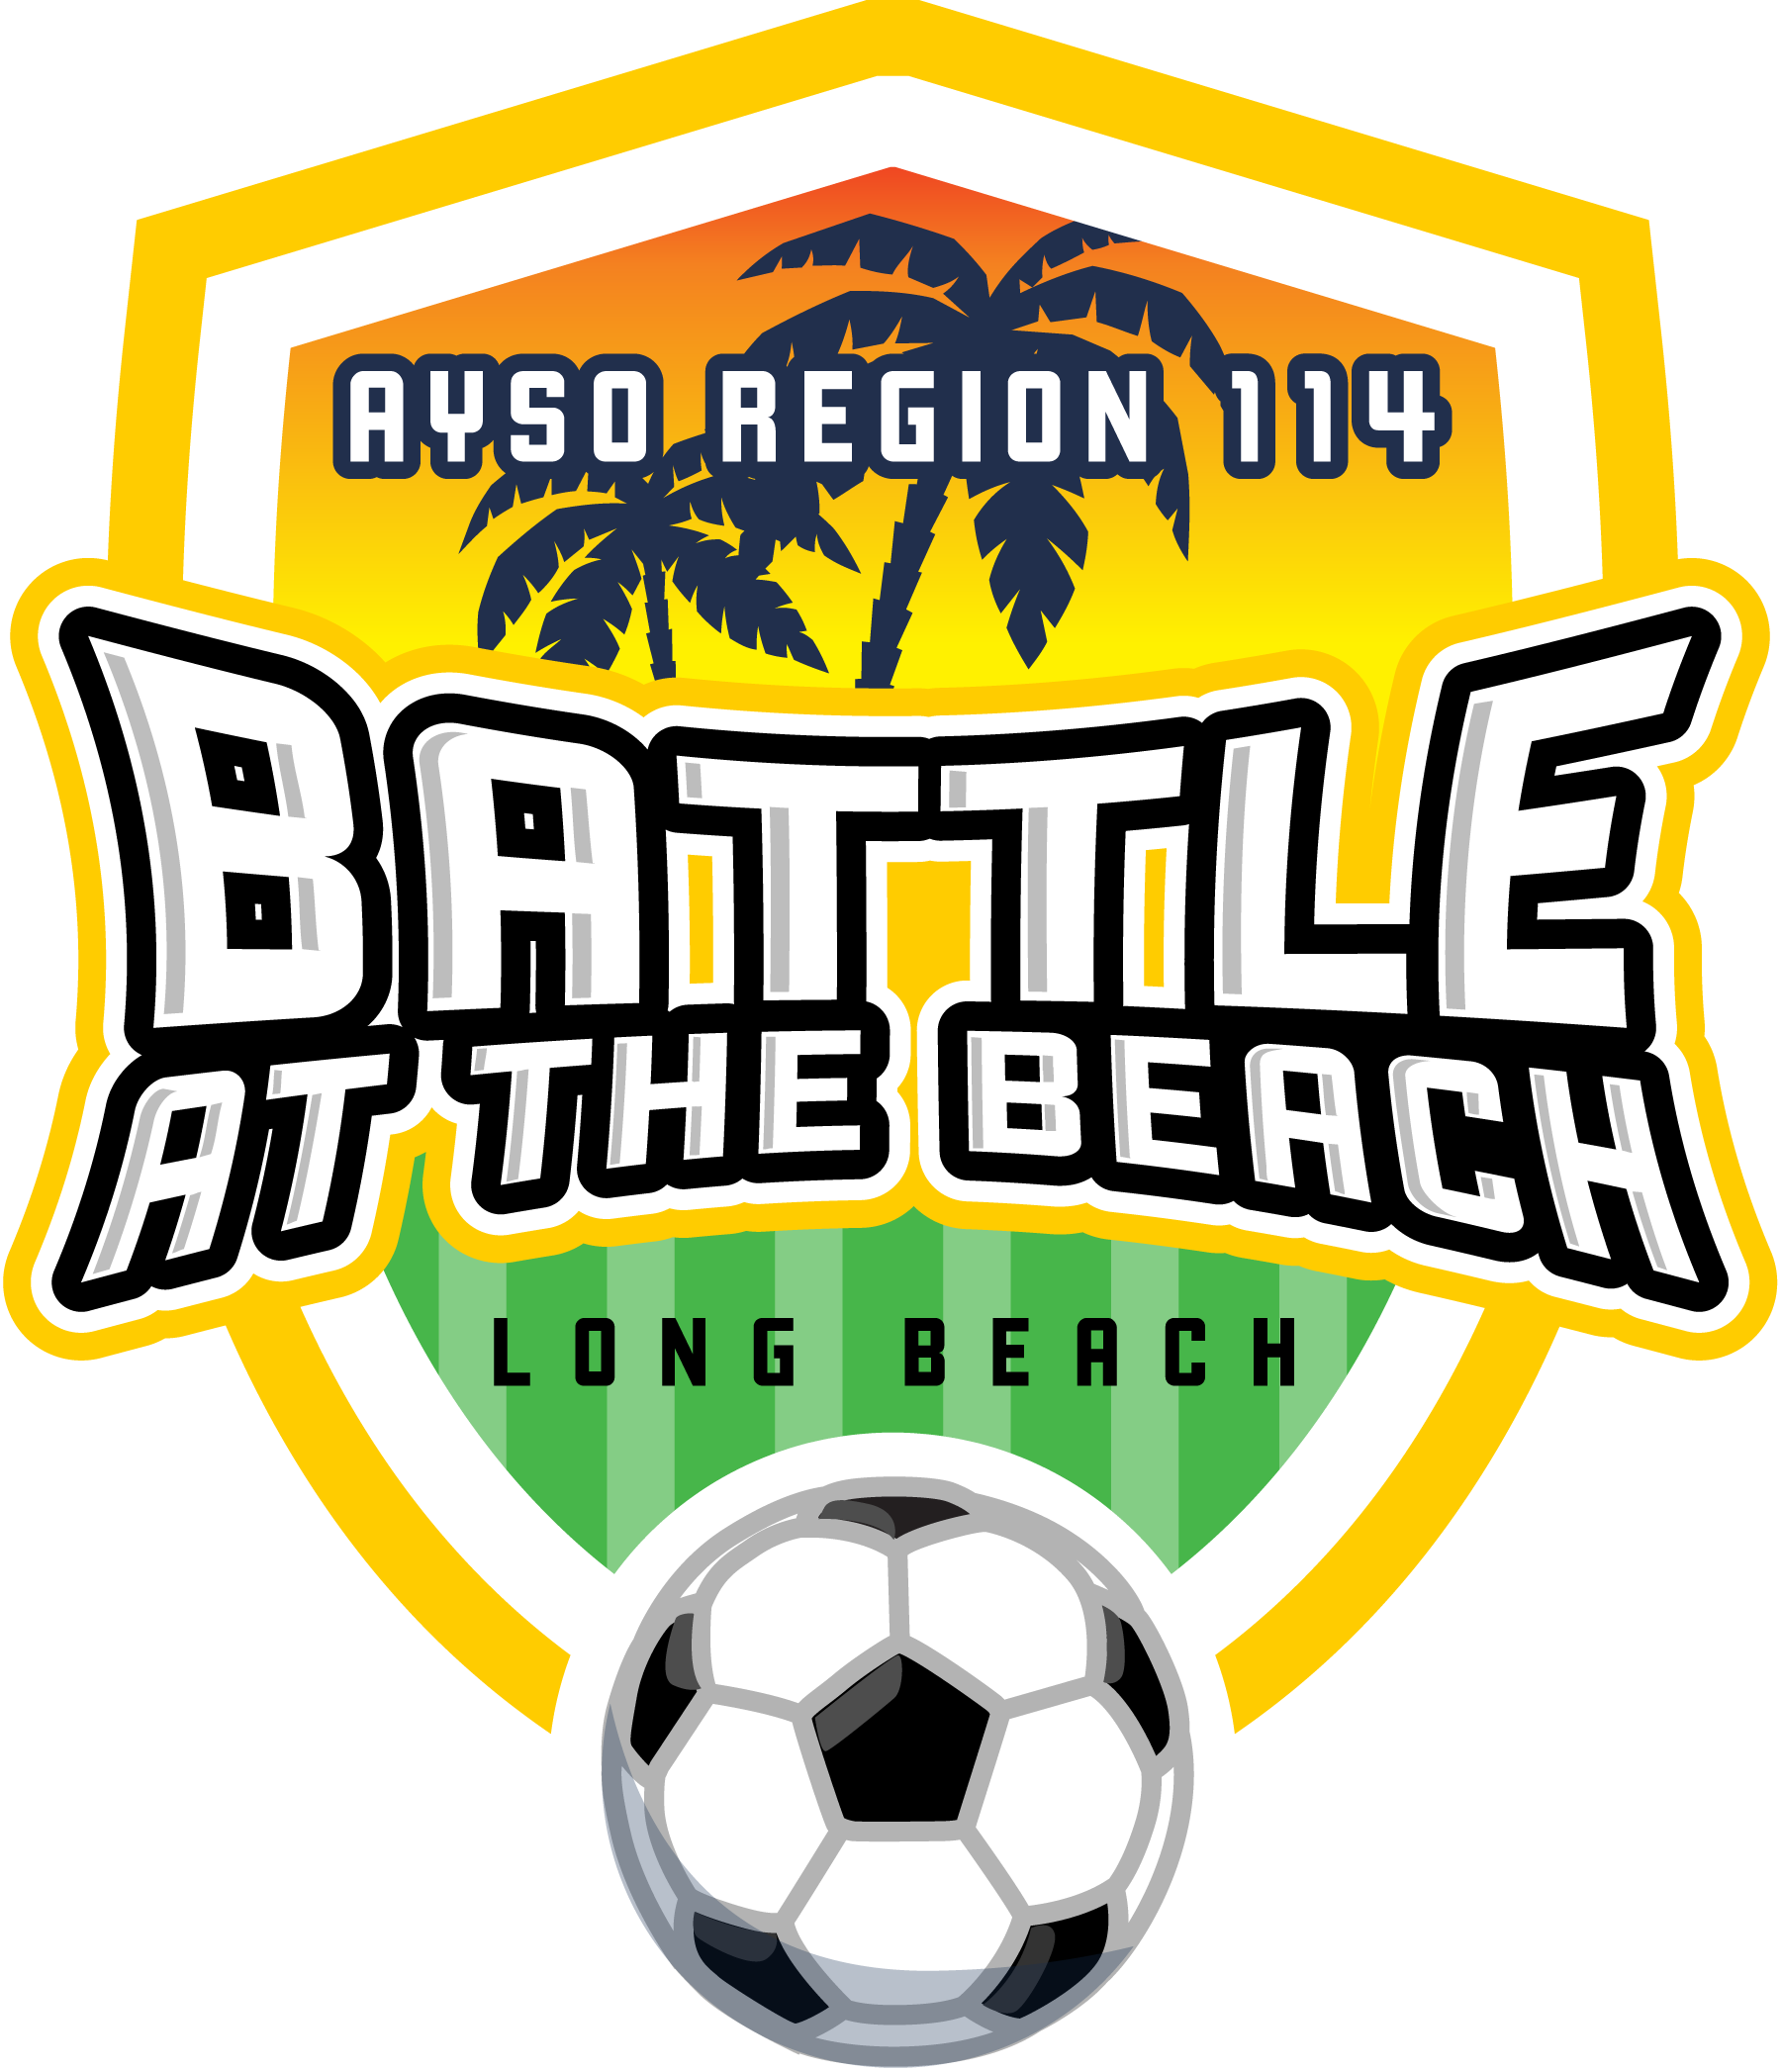 Region 114 Battle at the Beach Tournament